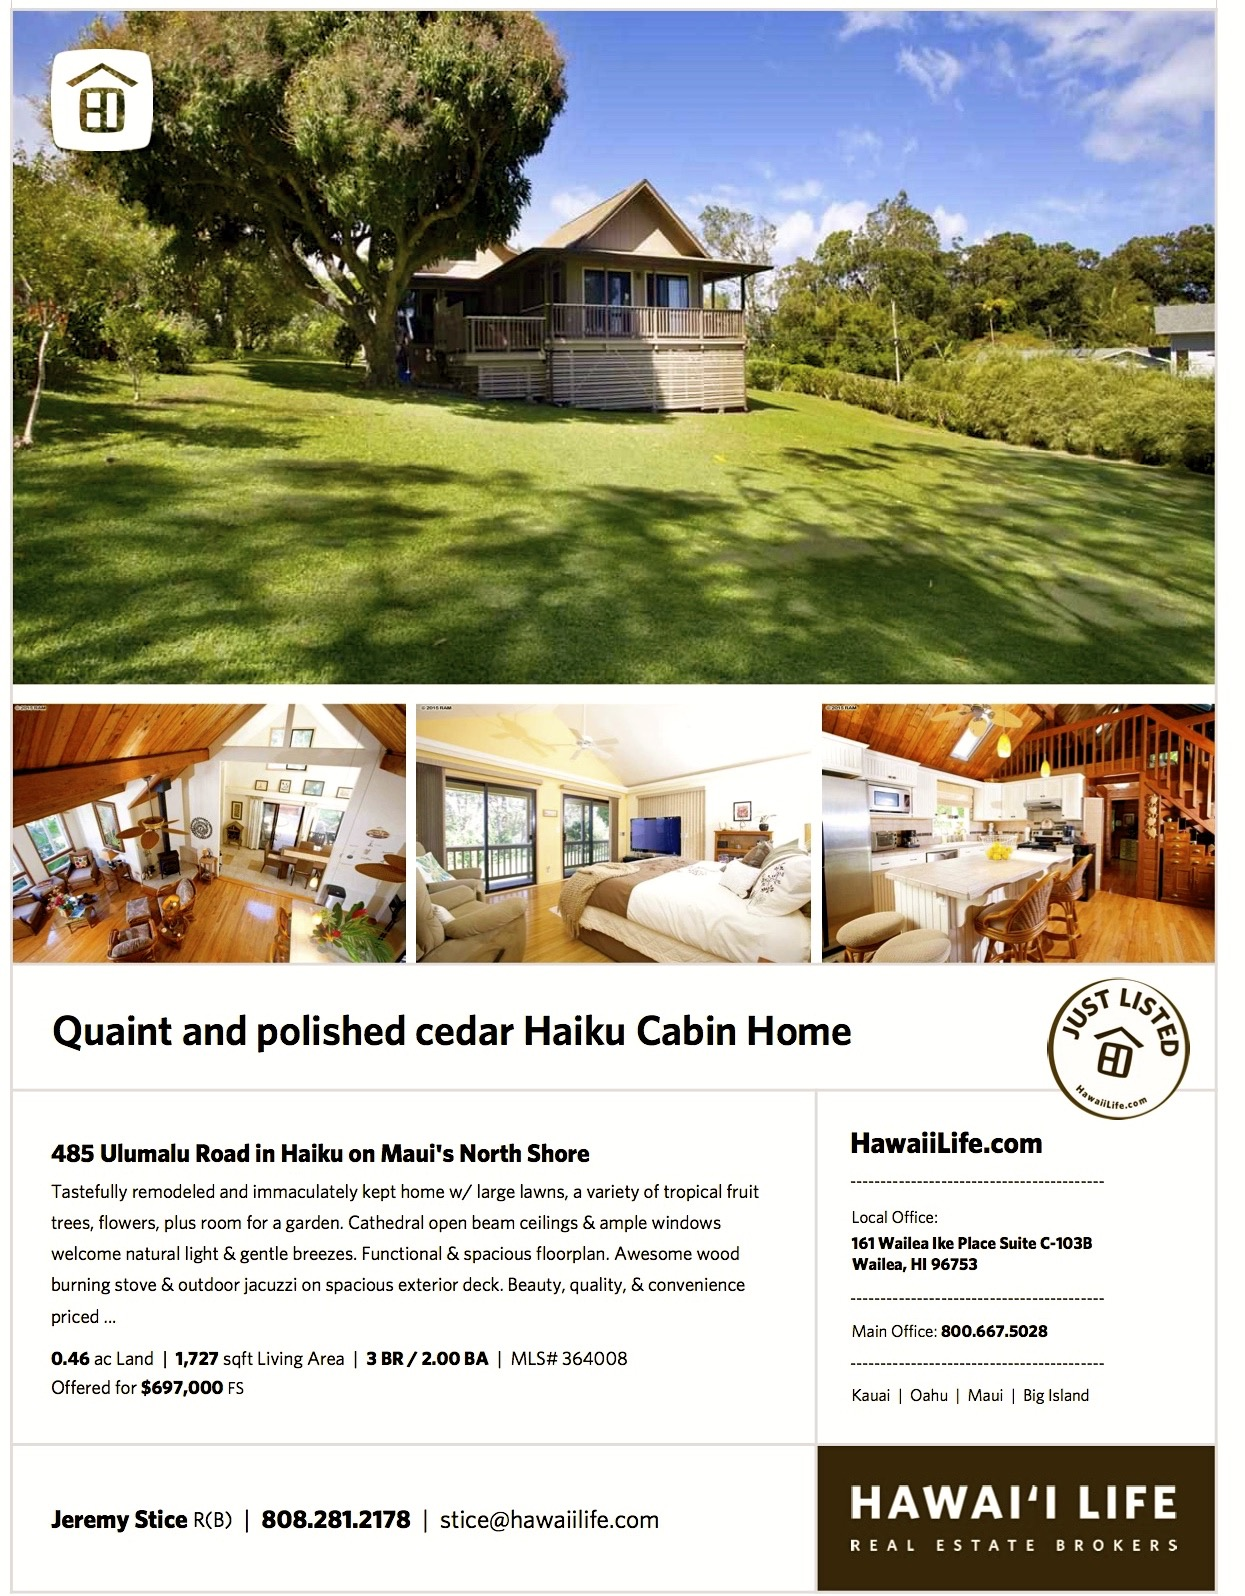 quaint haiku cabin home just listed on maui s north shore hawaii 485 ulumalu listing flyer